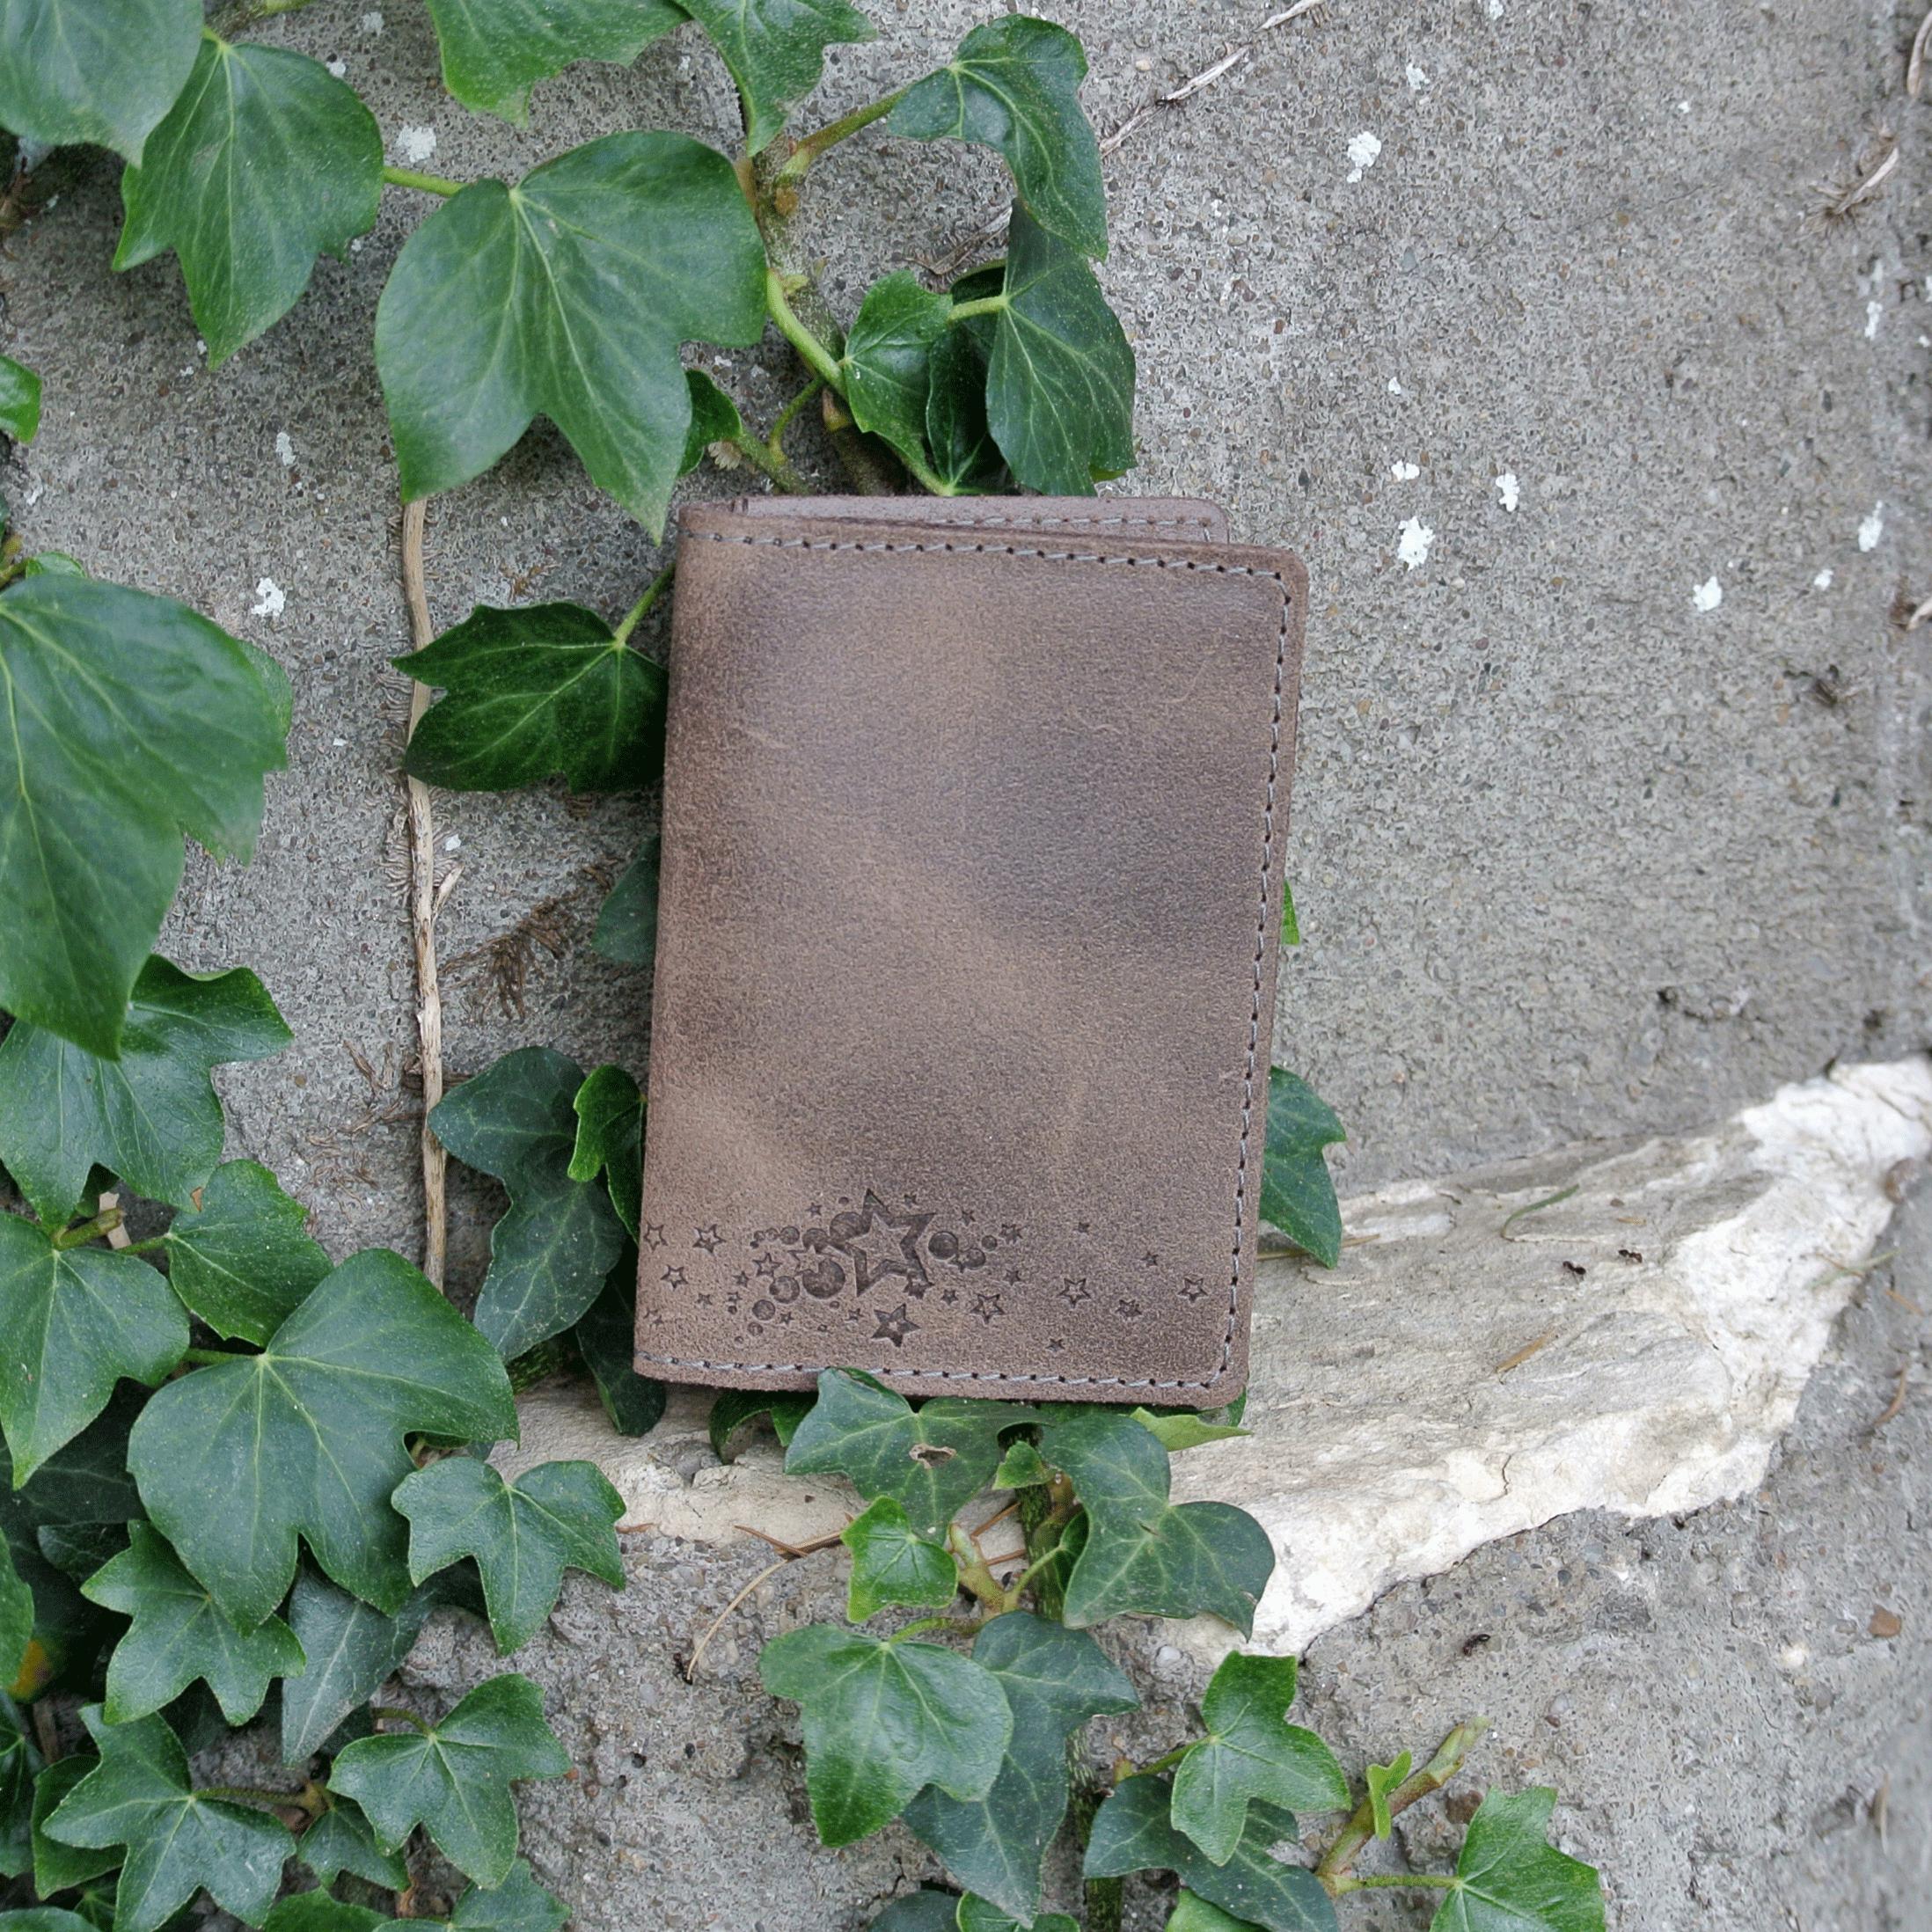 etui-double-a-cartes-cuirs-fantaisies-fabrique-en-france-made-in-france-cuirs-pailletés-la-cartabliere-portes-cartes-cuir-retro-cuirs-vague-cuirs-nappa